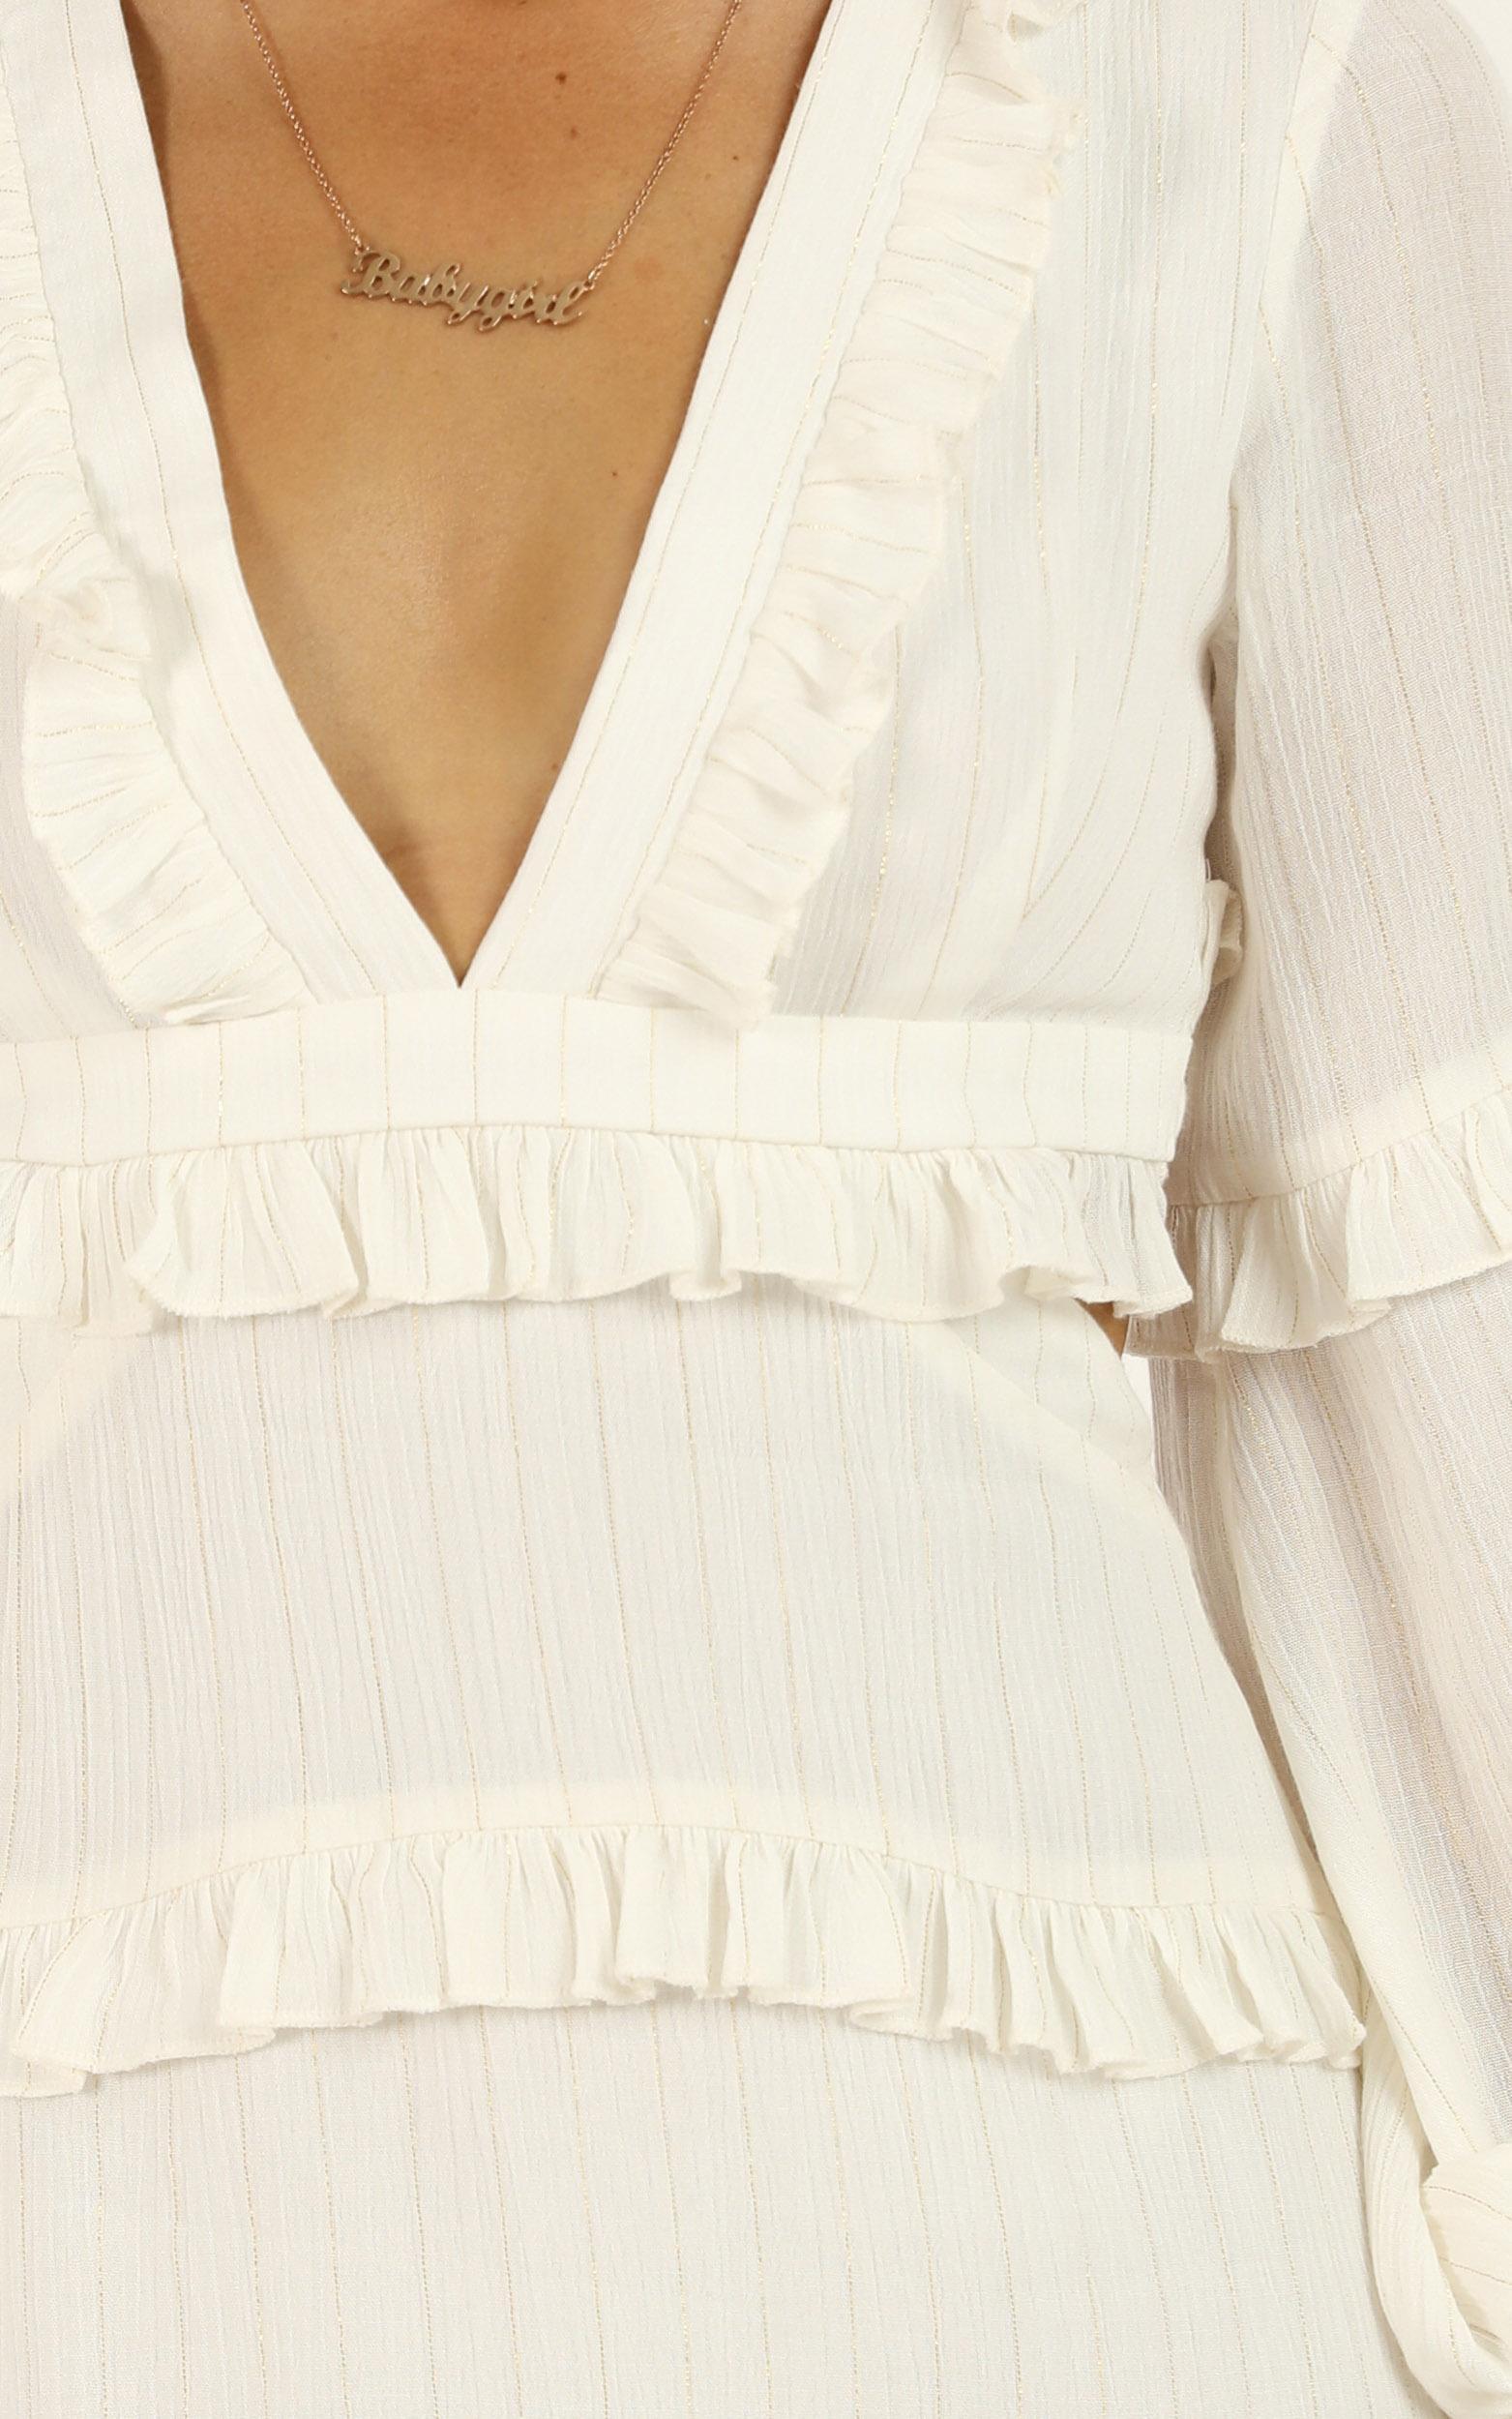 I Feel Great Dress In white lurex Stripe - 20 (XXXXL), White, hi-res image number null